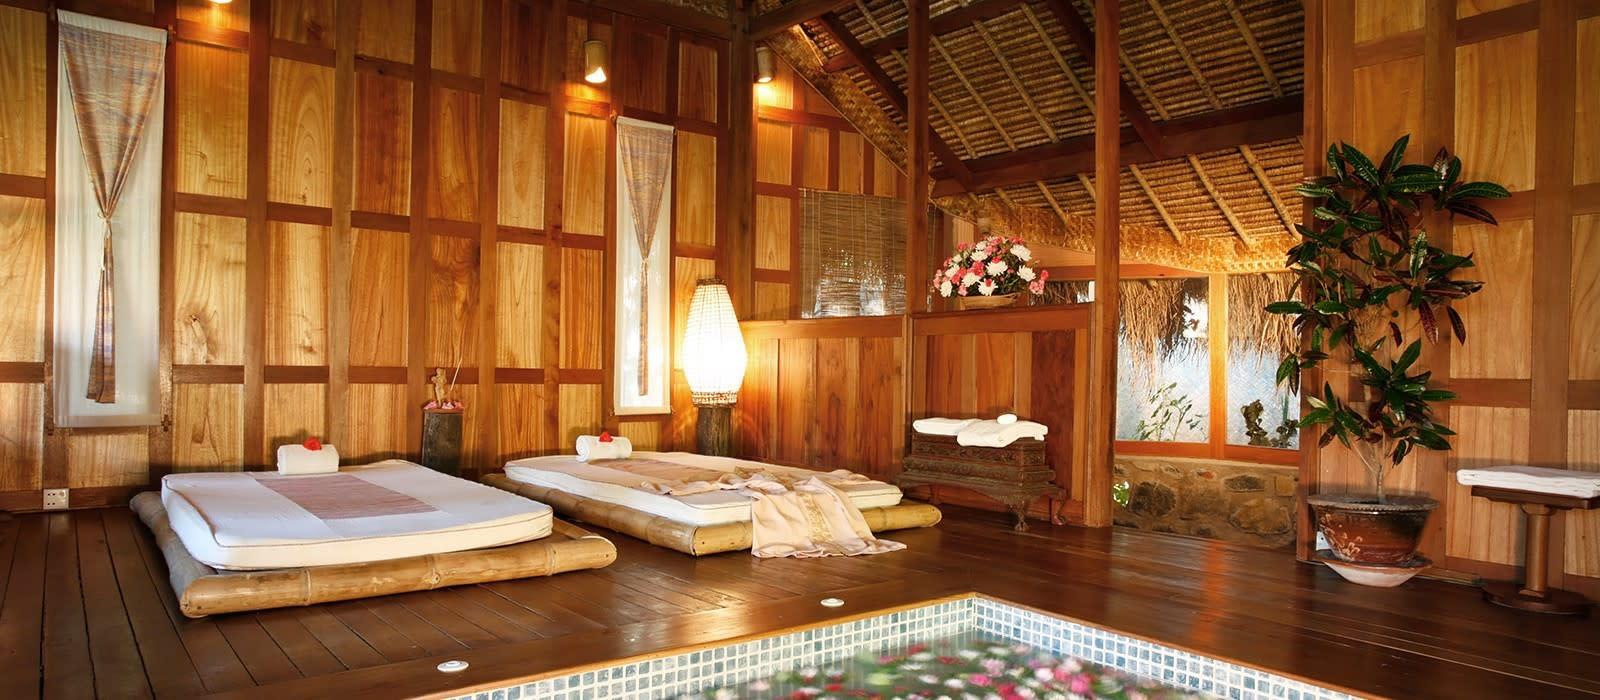 Hotel Inle Lake View Resort and Spa Myanmar